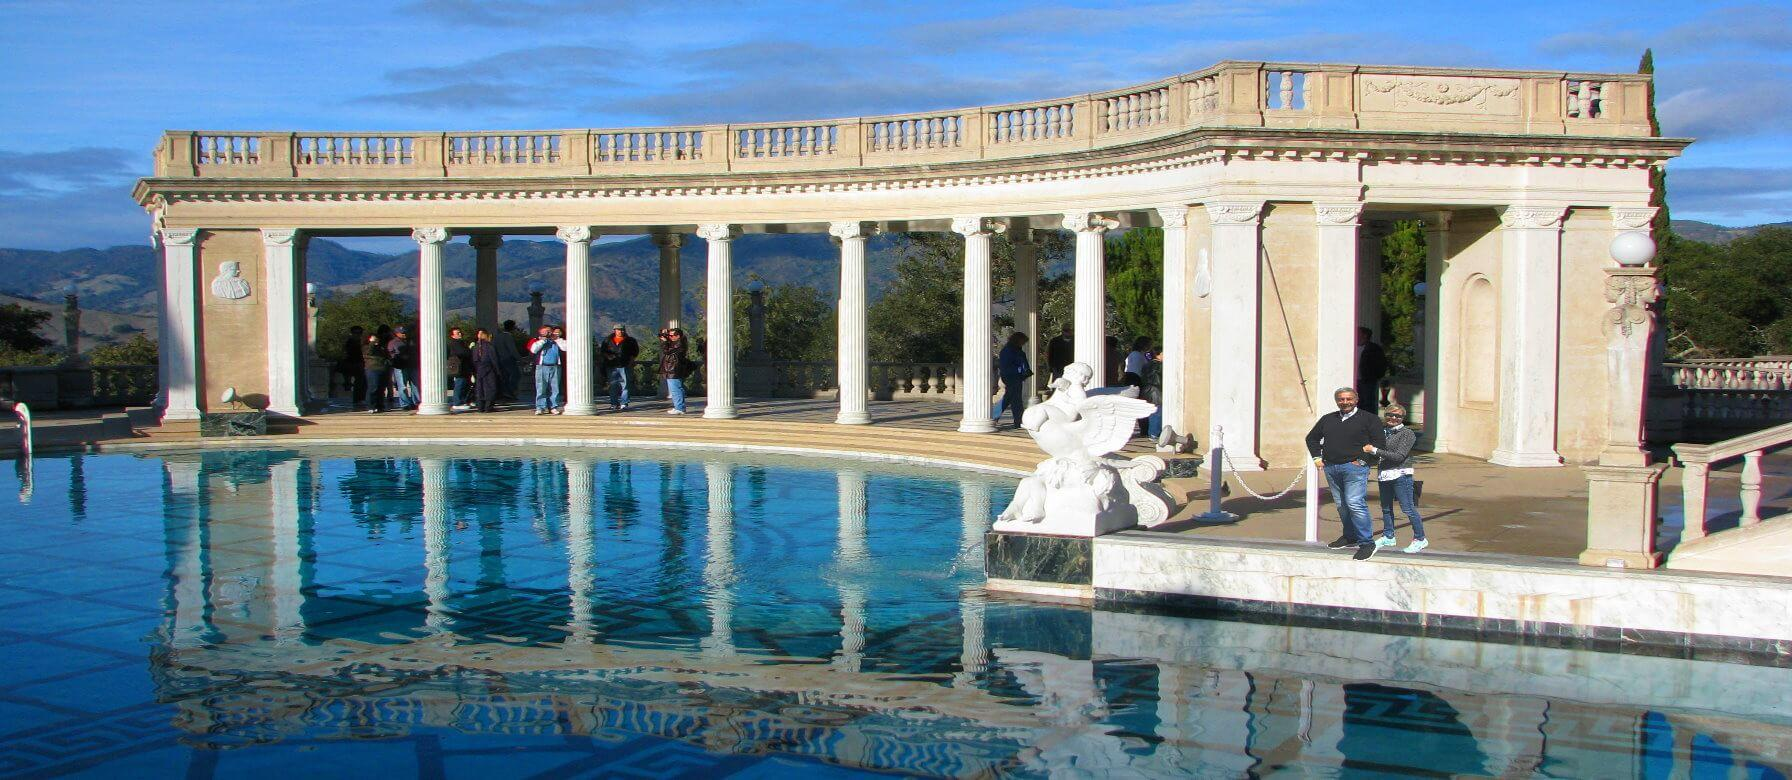 Hearst-Castle-Neptune-Pool-Art-Castle-Tours(1)